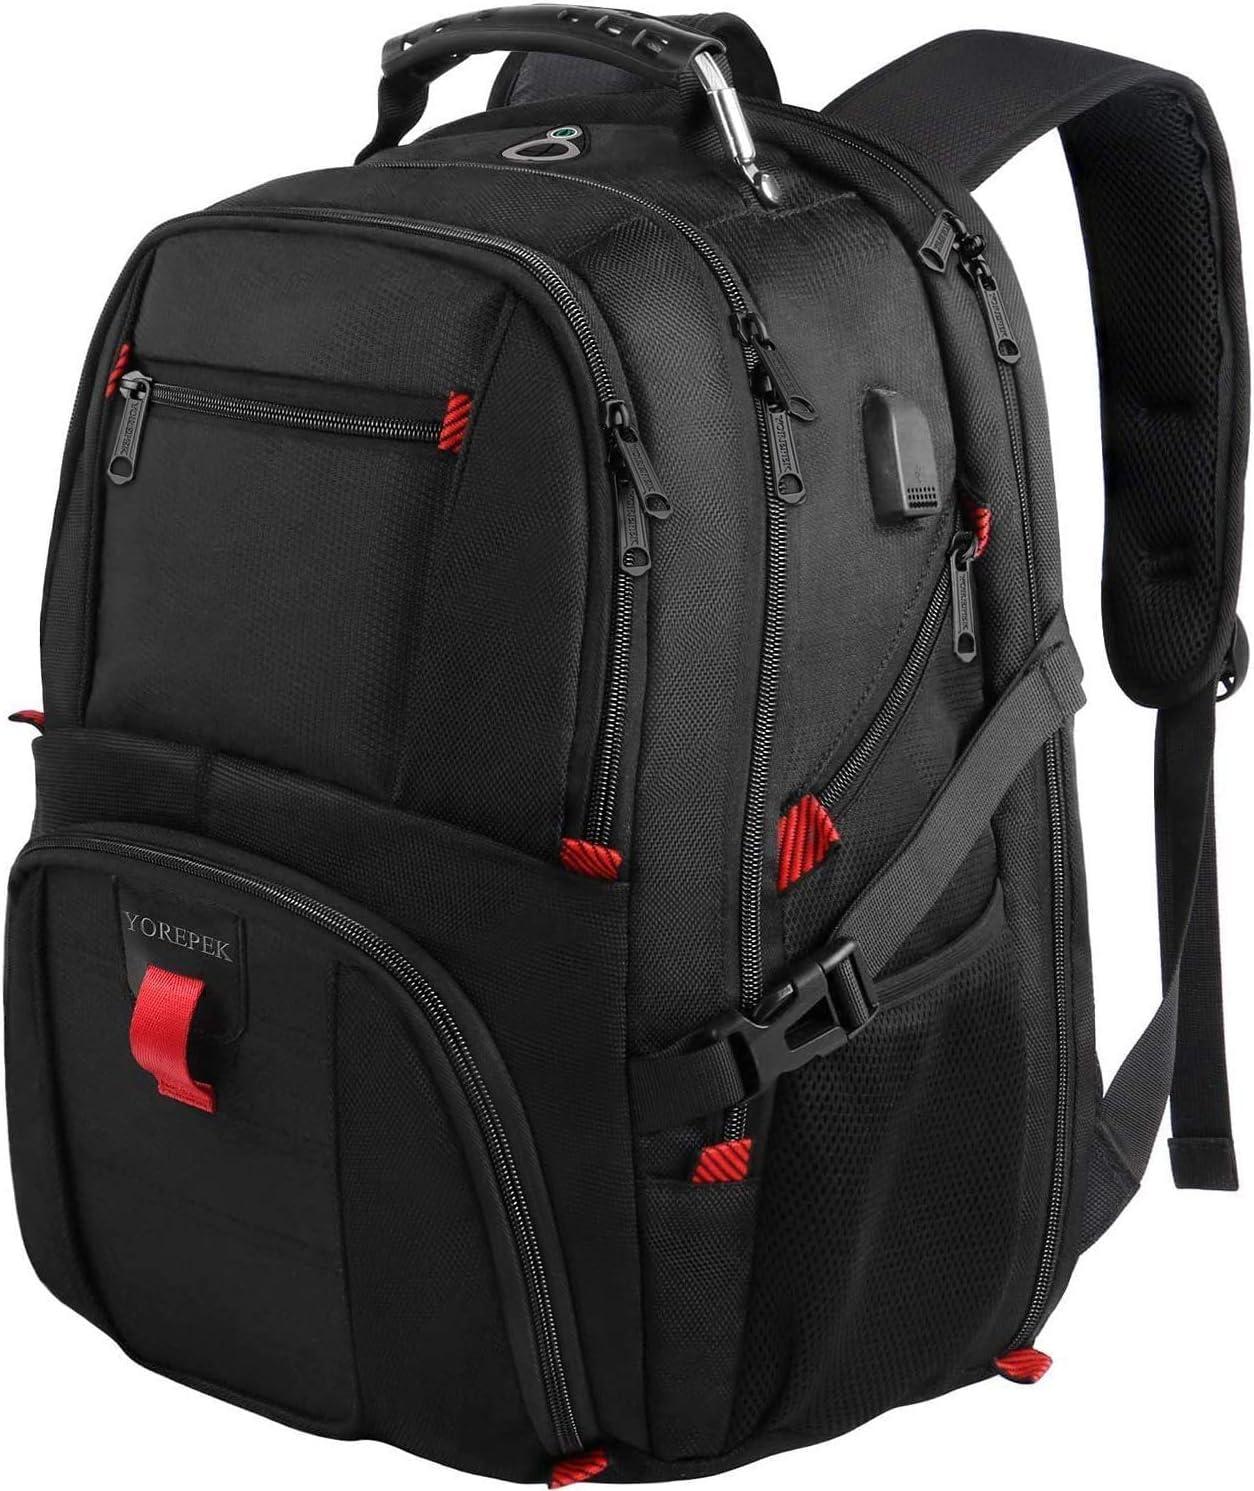 Backpacks for Men, Extra Large Travel Laptop Backpack Gifts for Women Men